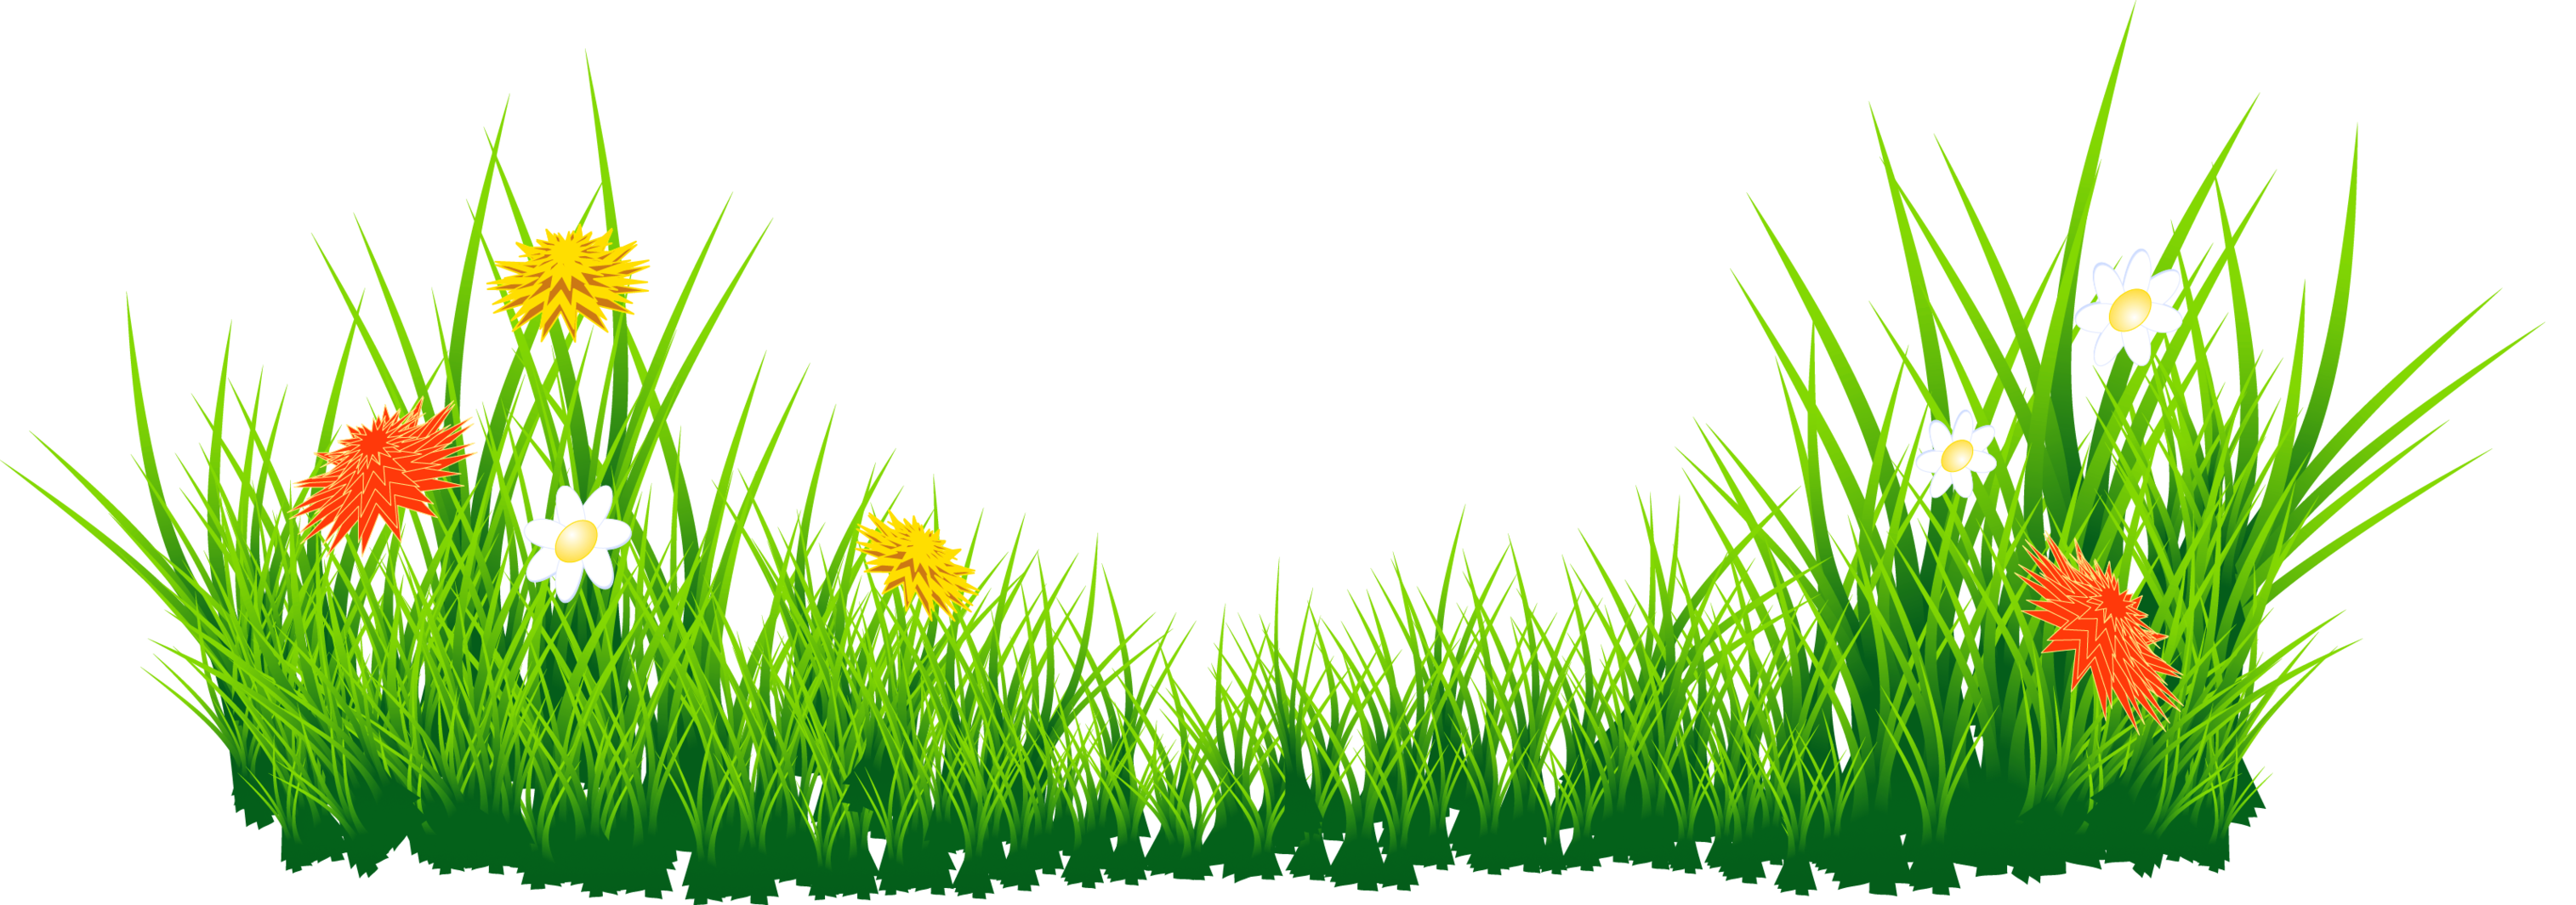 Sea Grass clipart grass border #8